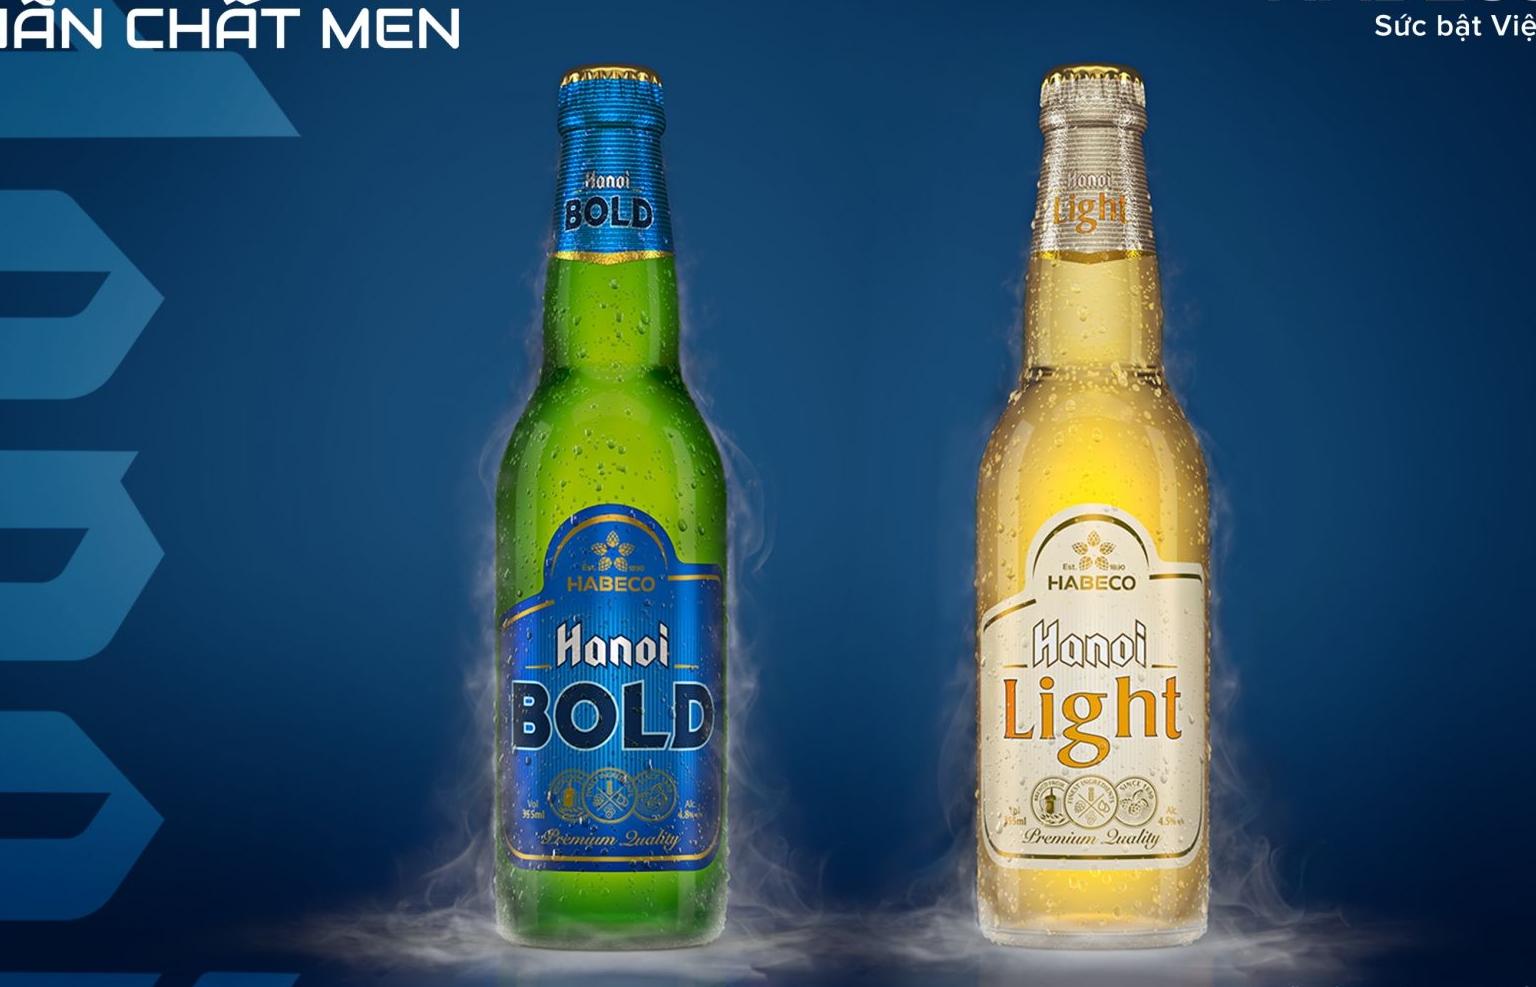 bung no trai nghiem voi hanoi bold va hanoi light vi bia danh cho gioi tre